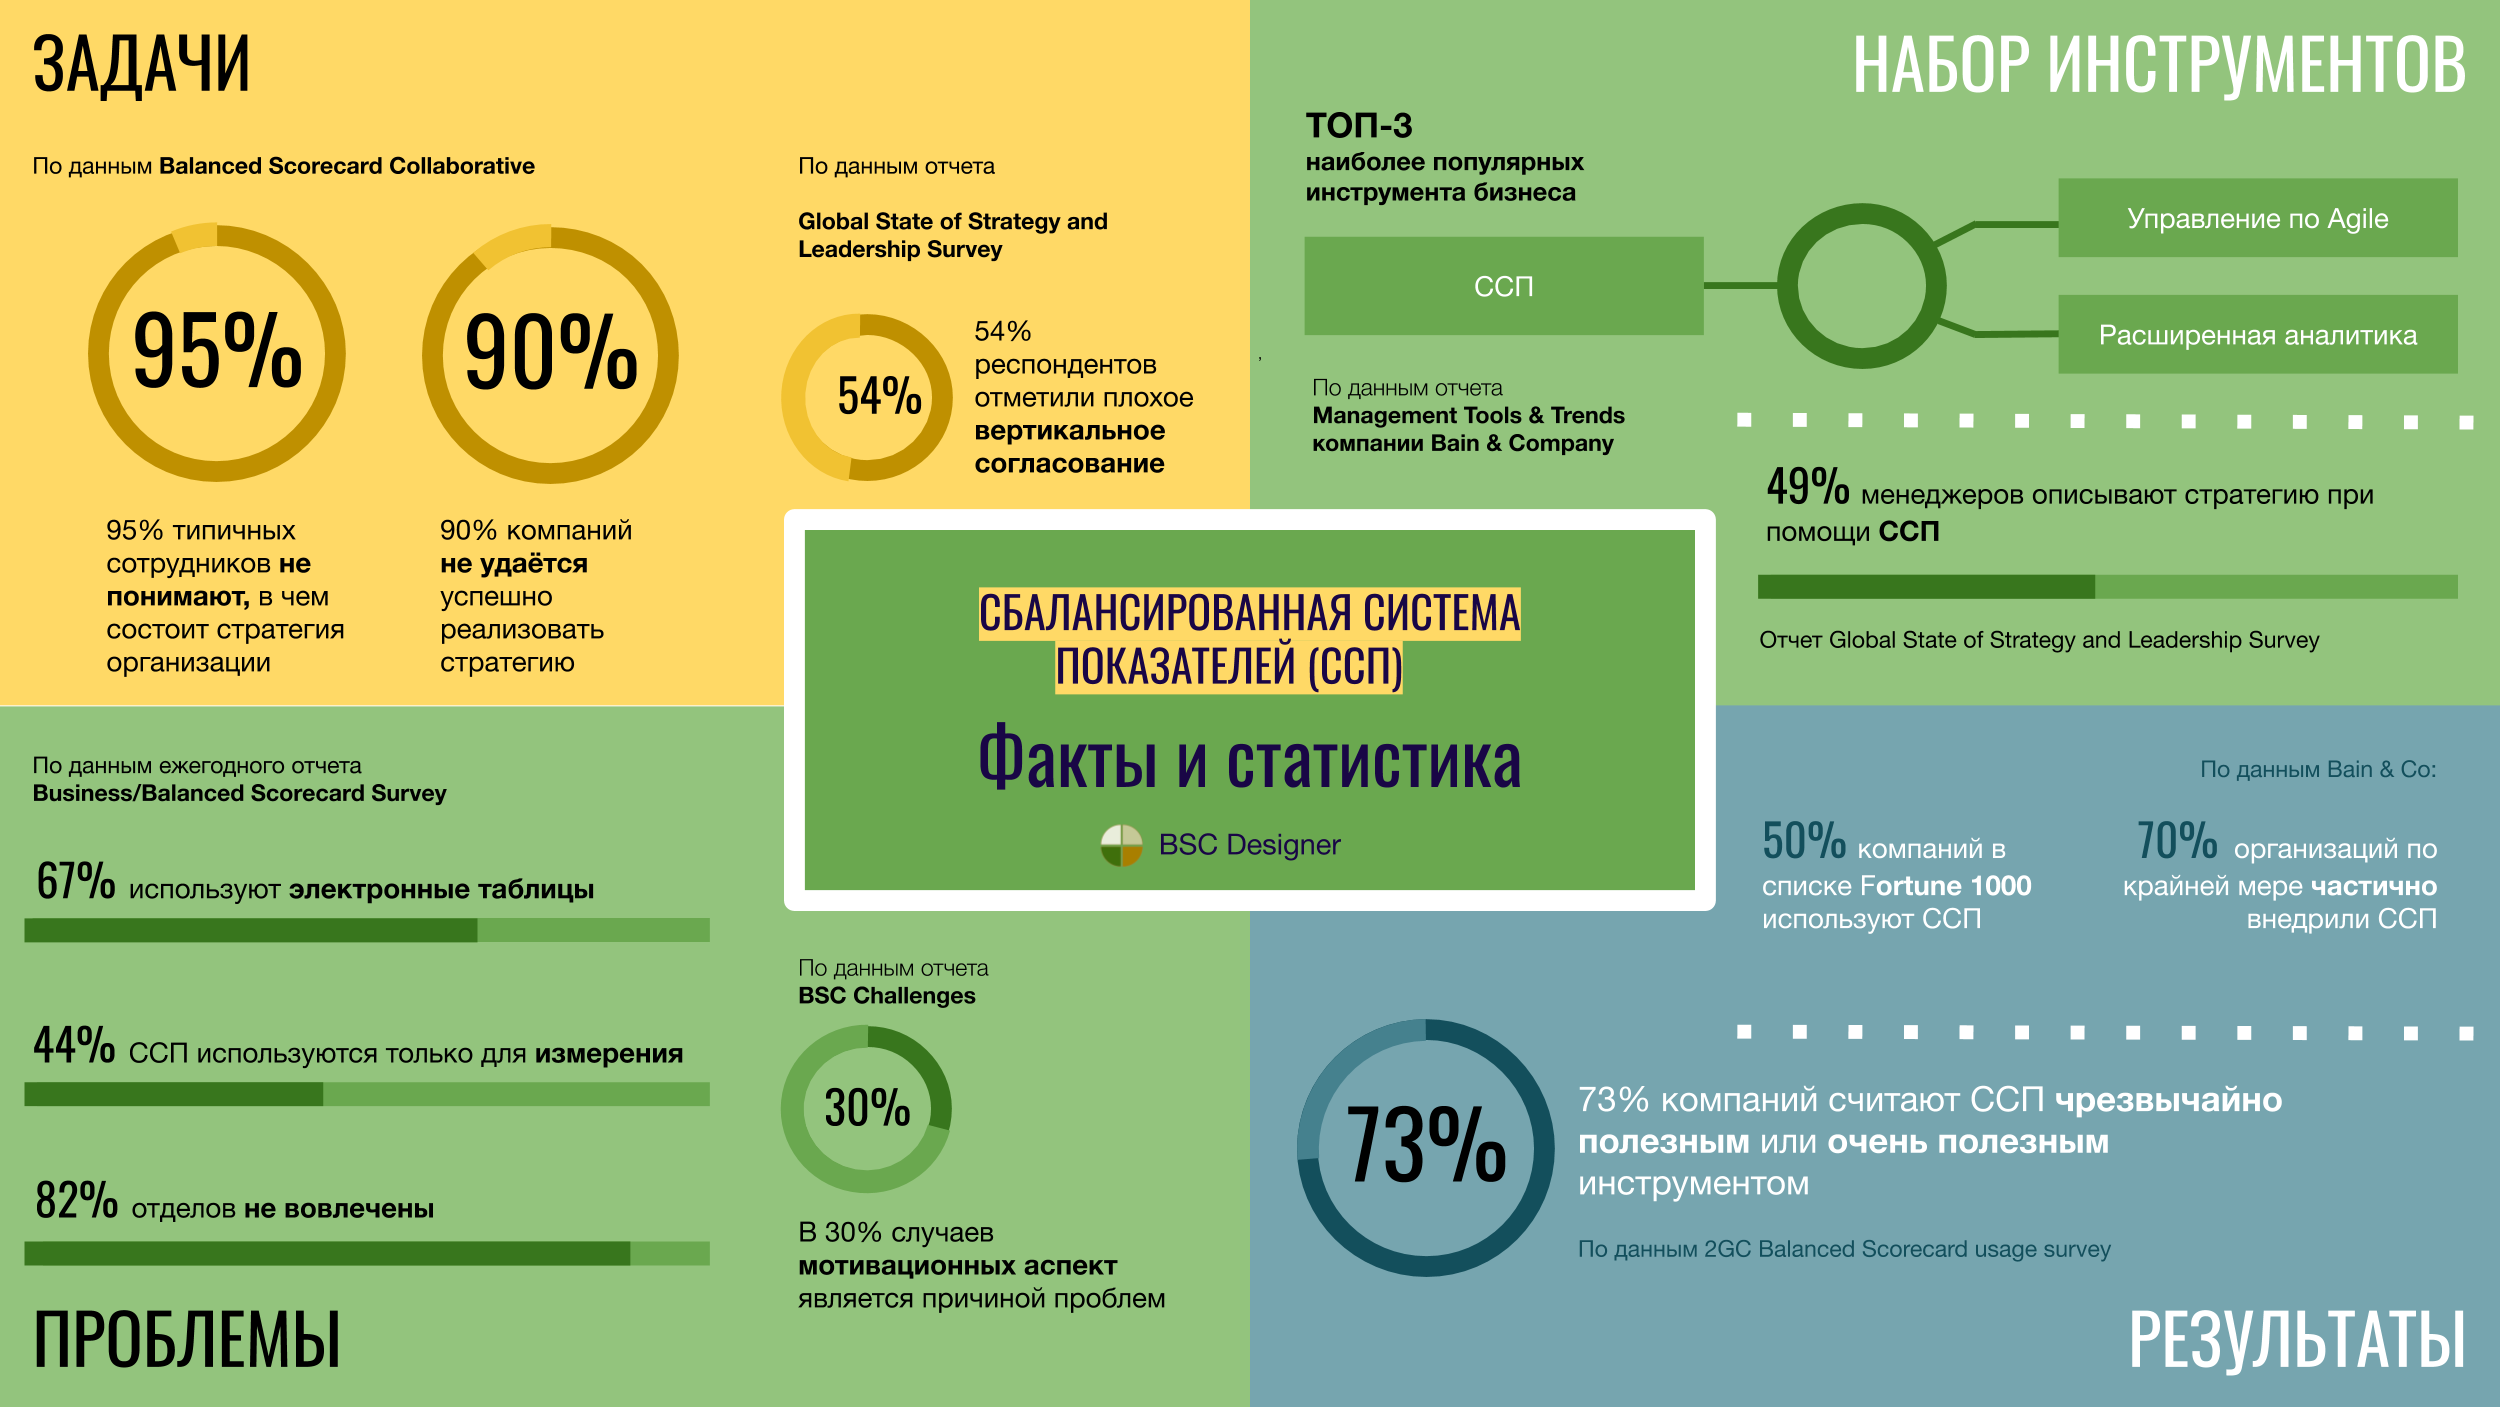 Инфографика ССП - Balanced Scorecard